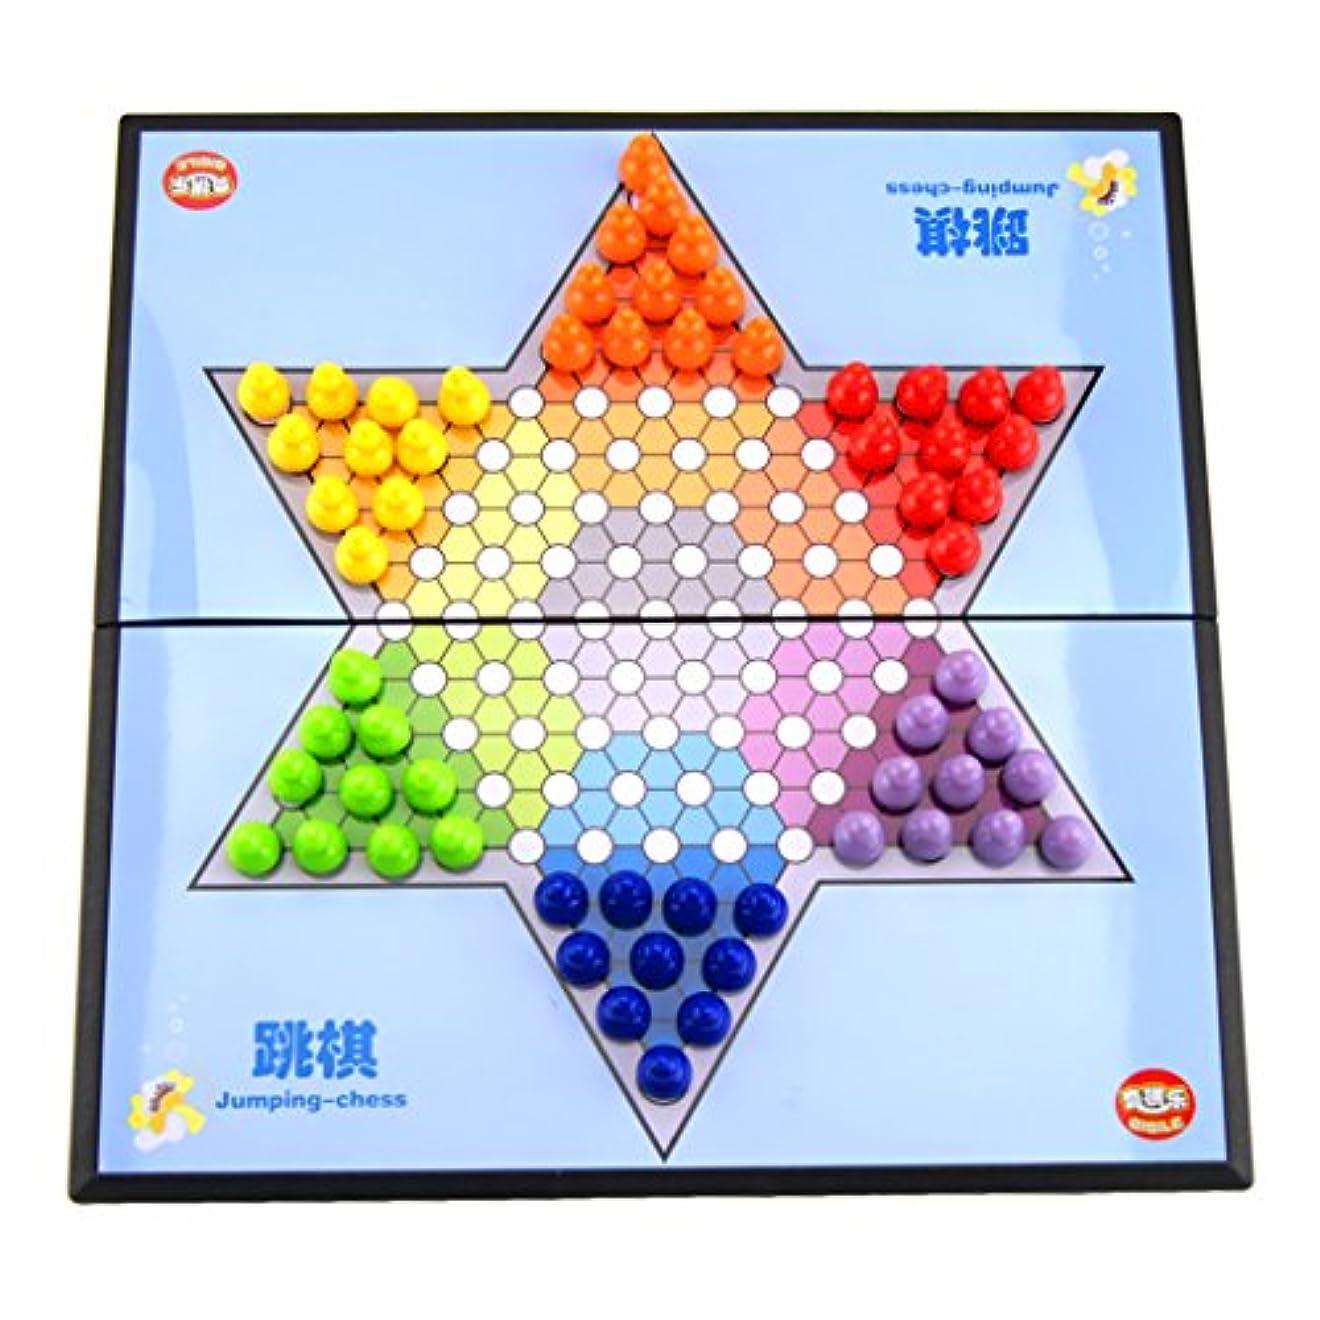 Baoblaze 磁気 折り畳み チェスボード おもちゃ  贈り物 児童知育 ゲーム